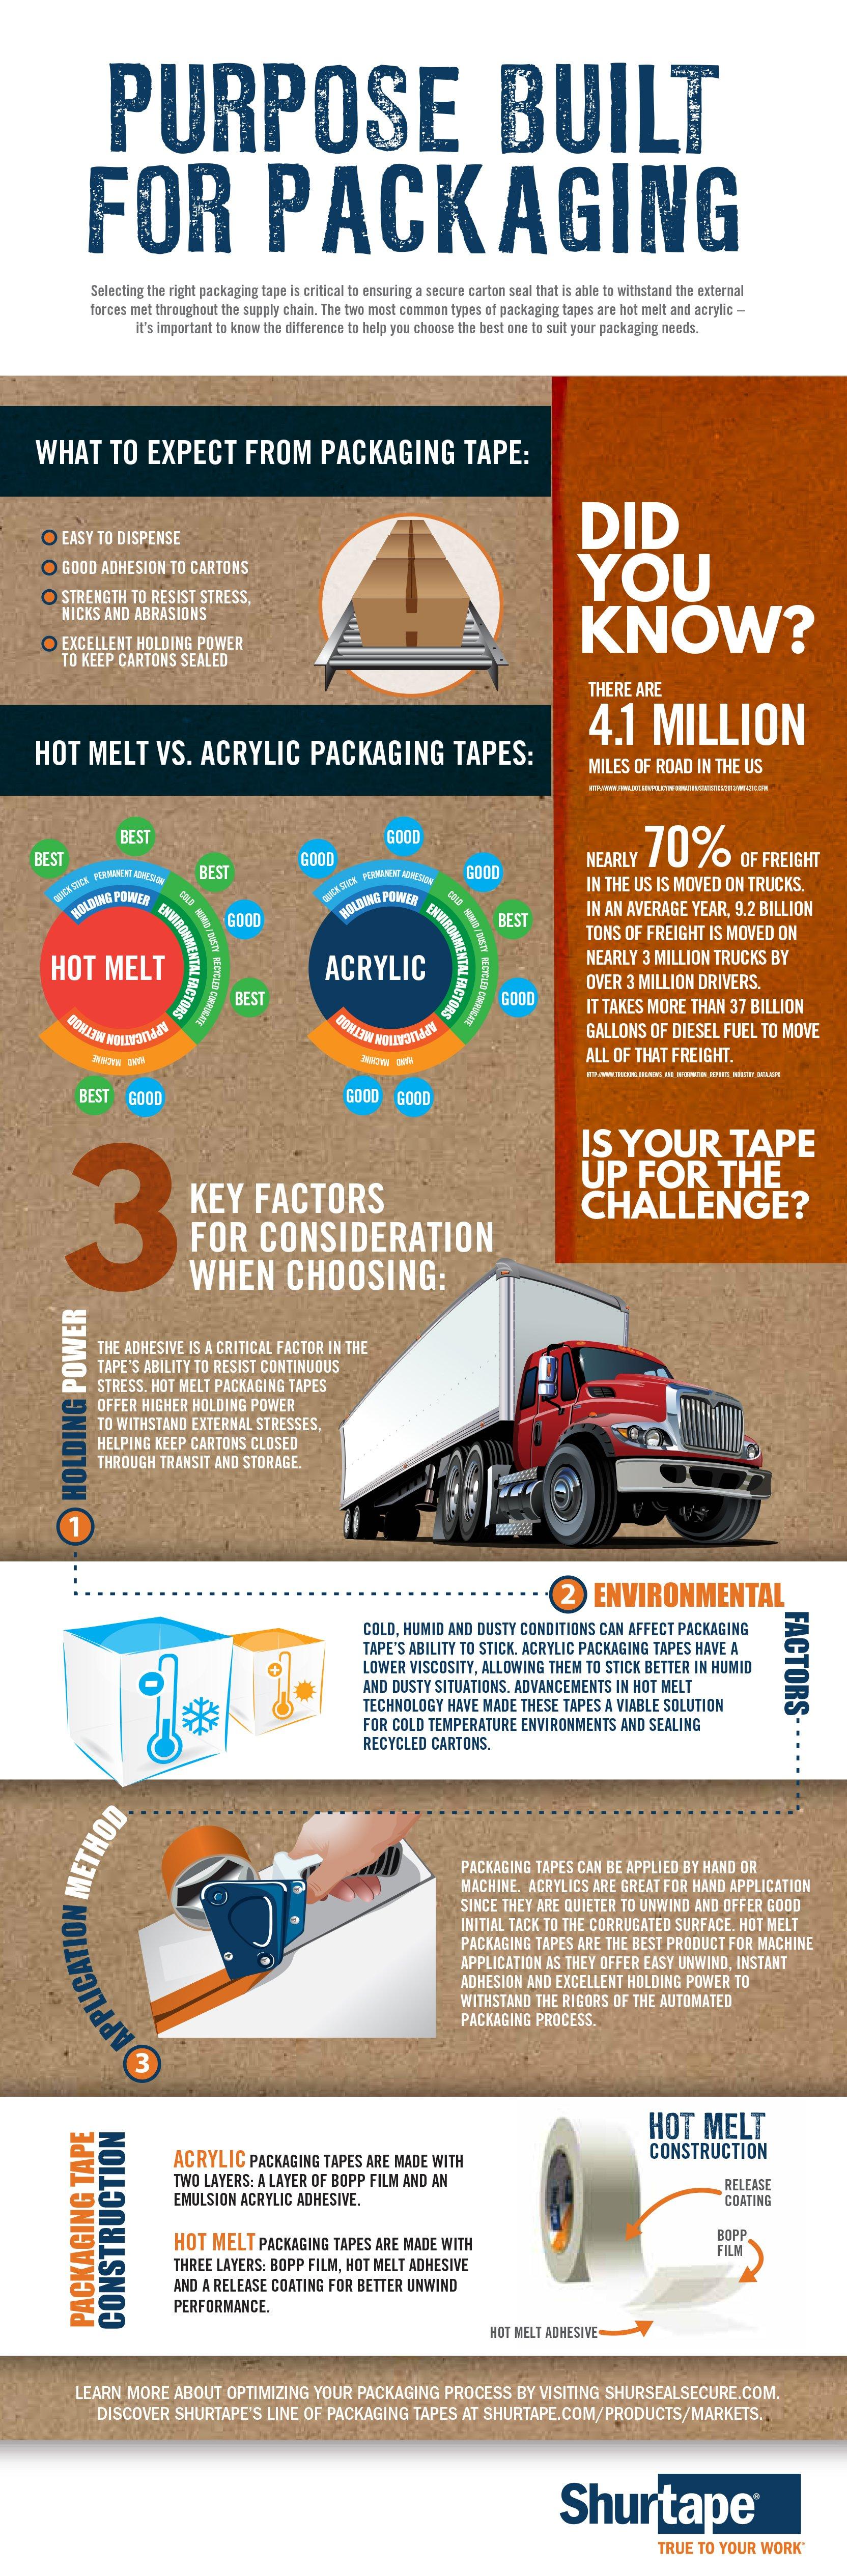 Hot Melt vs. Acrylic Infographic